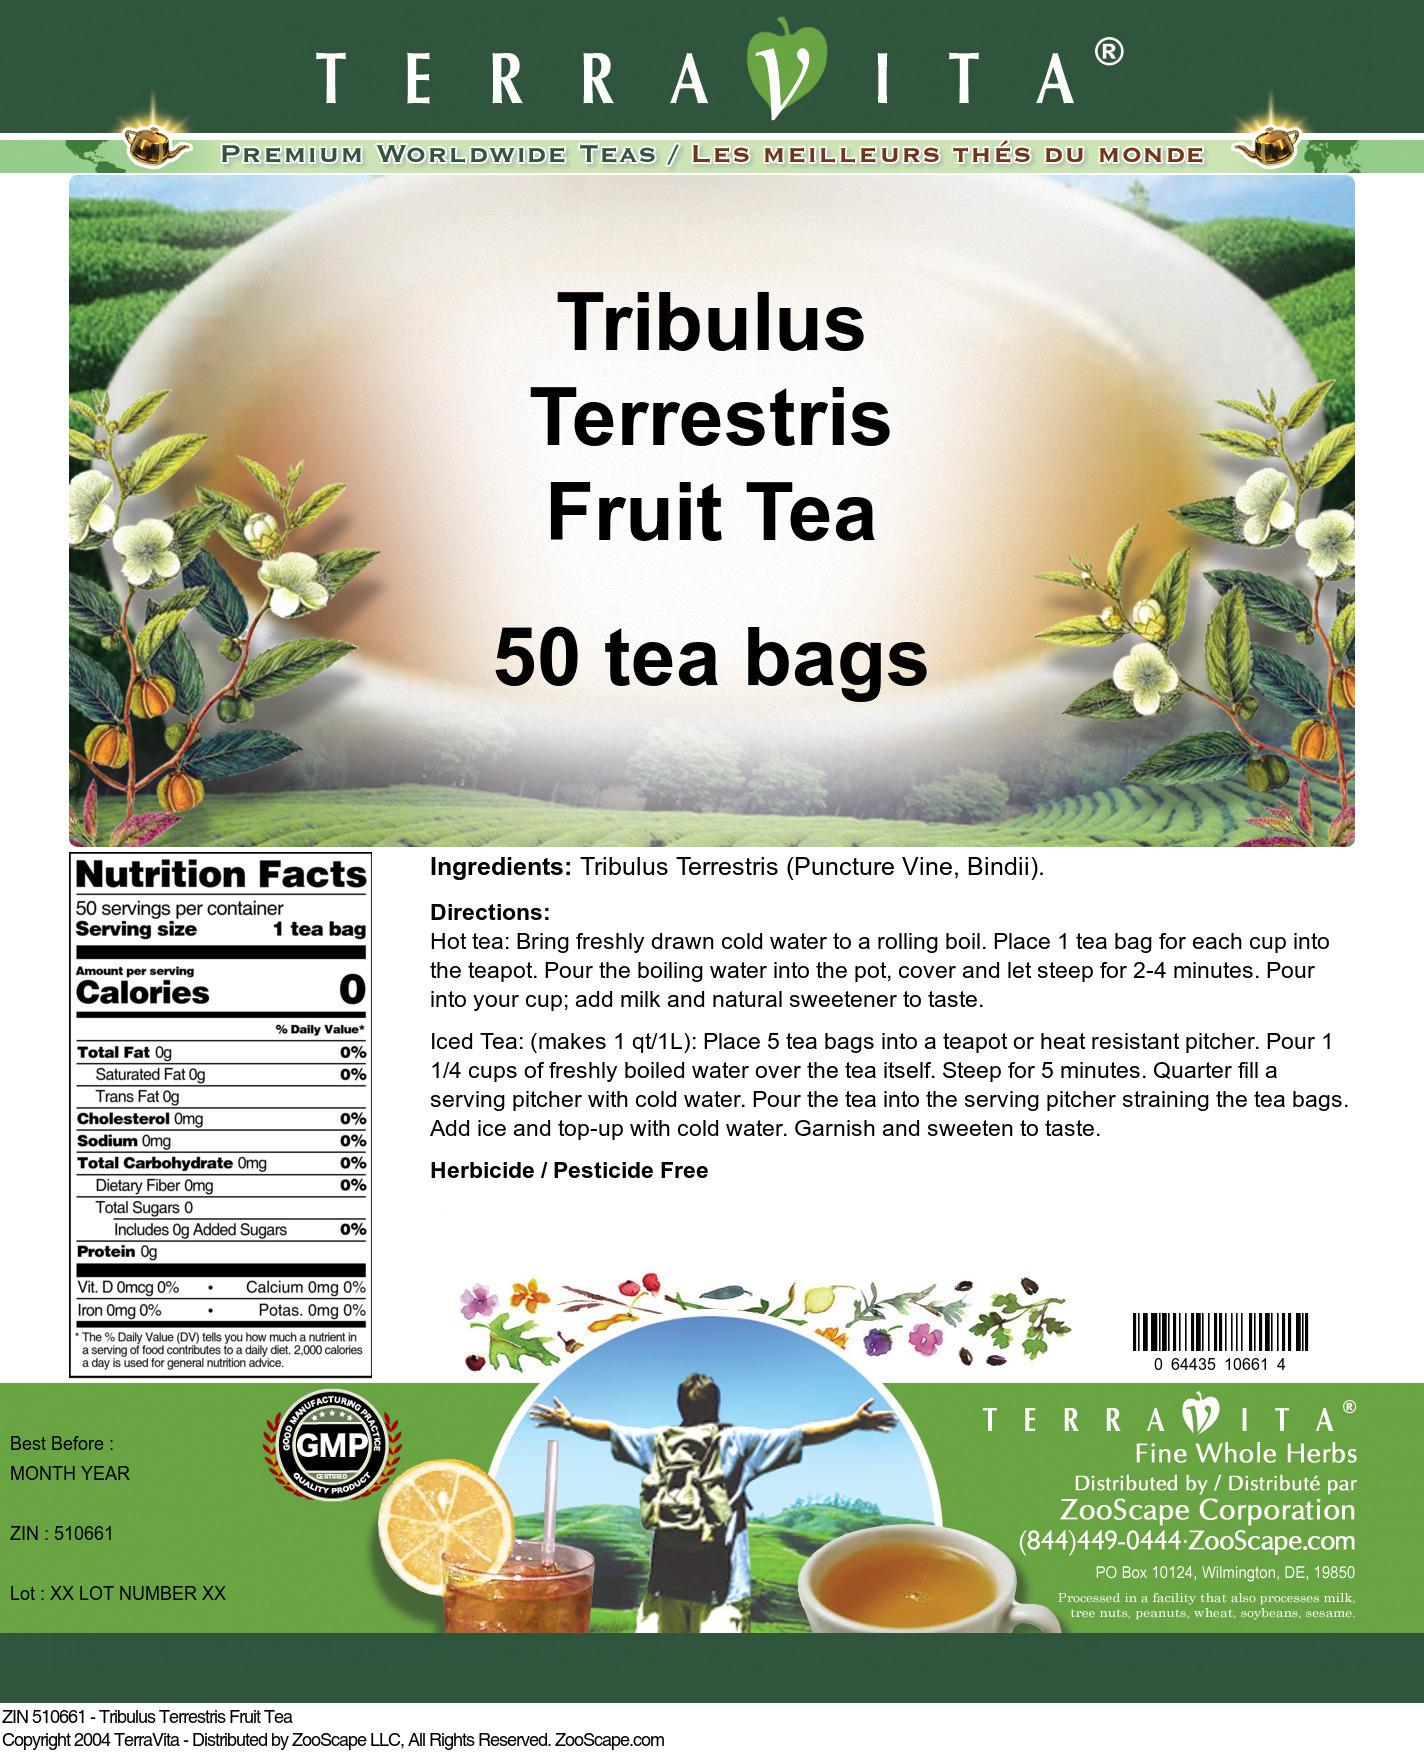 Tribulus Terrestris Fruit Tea